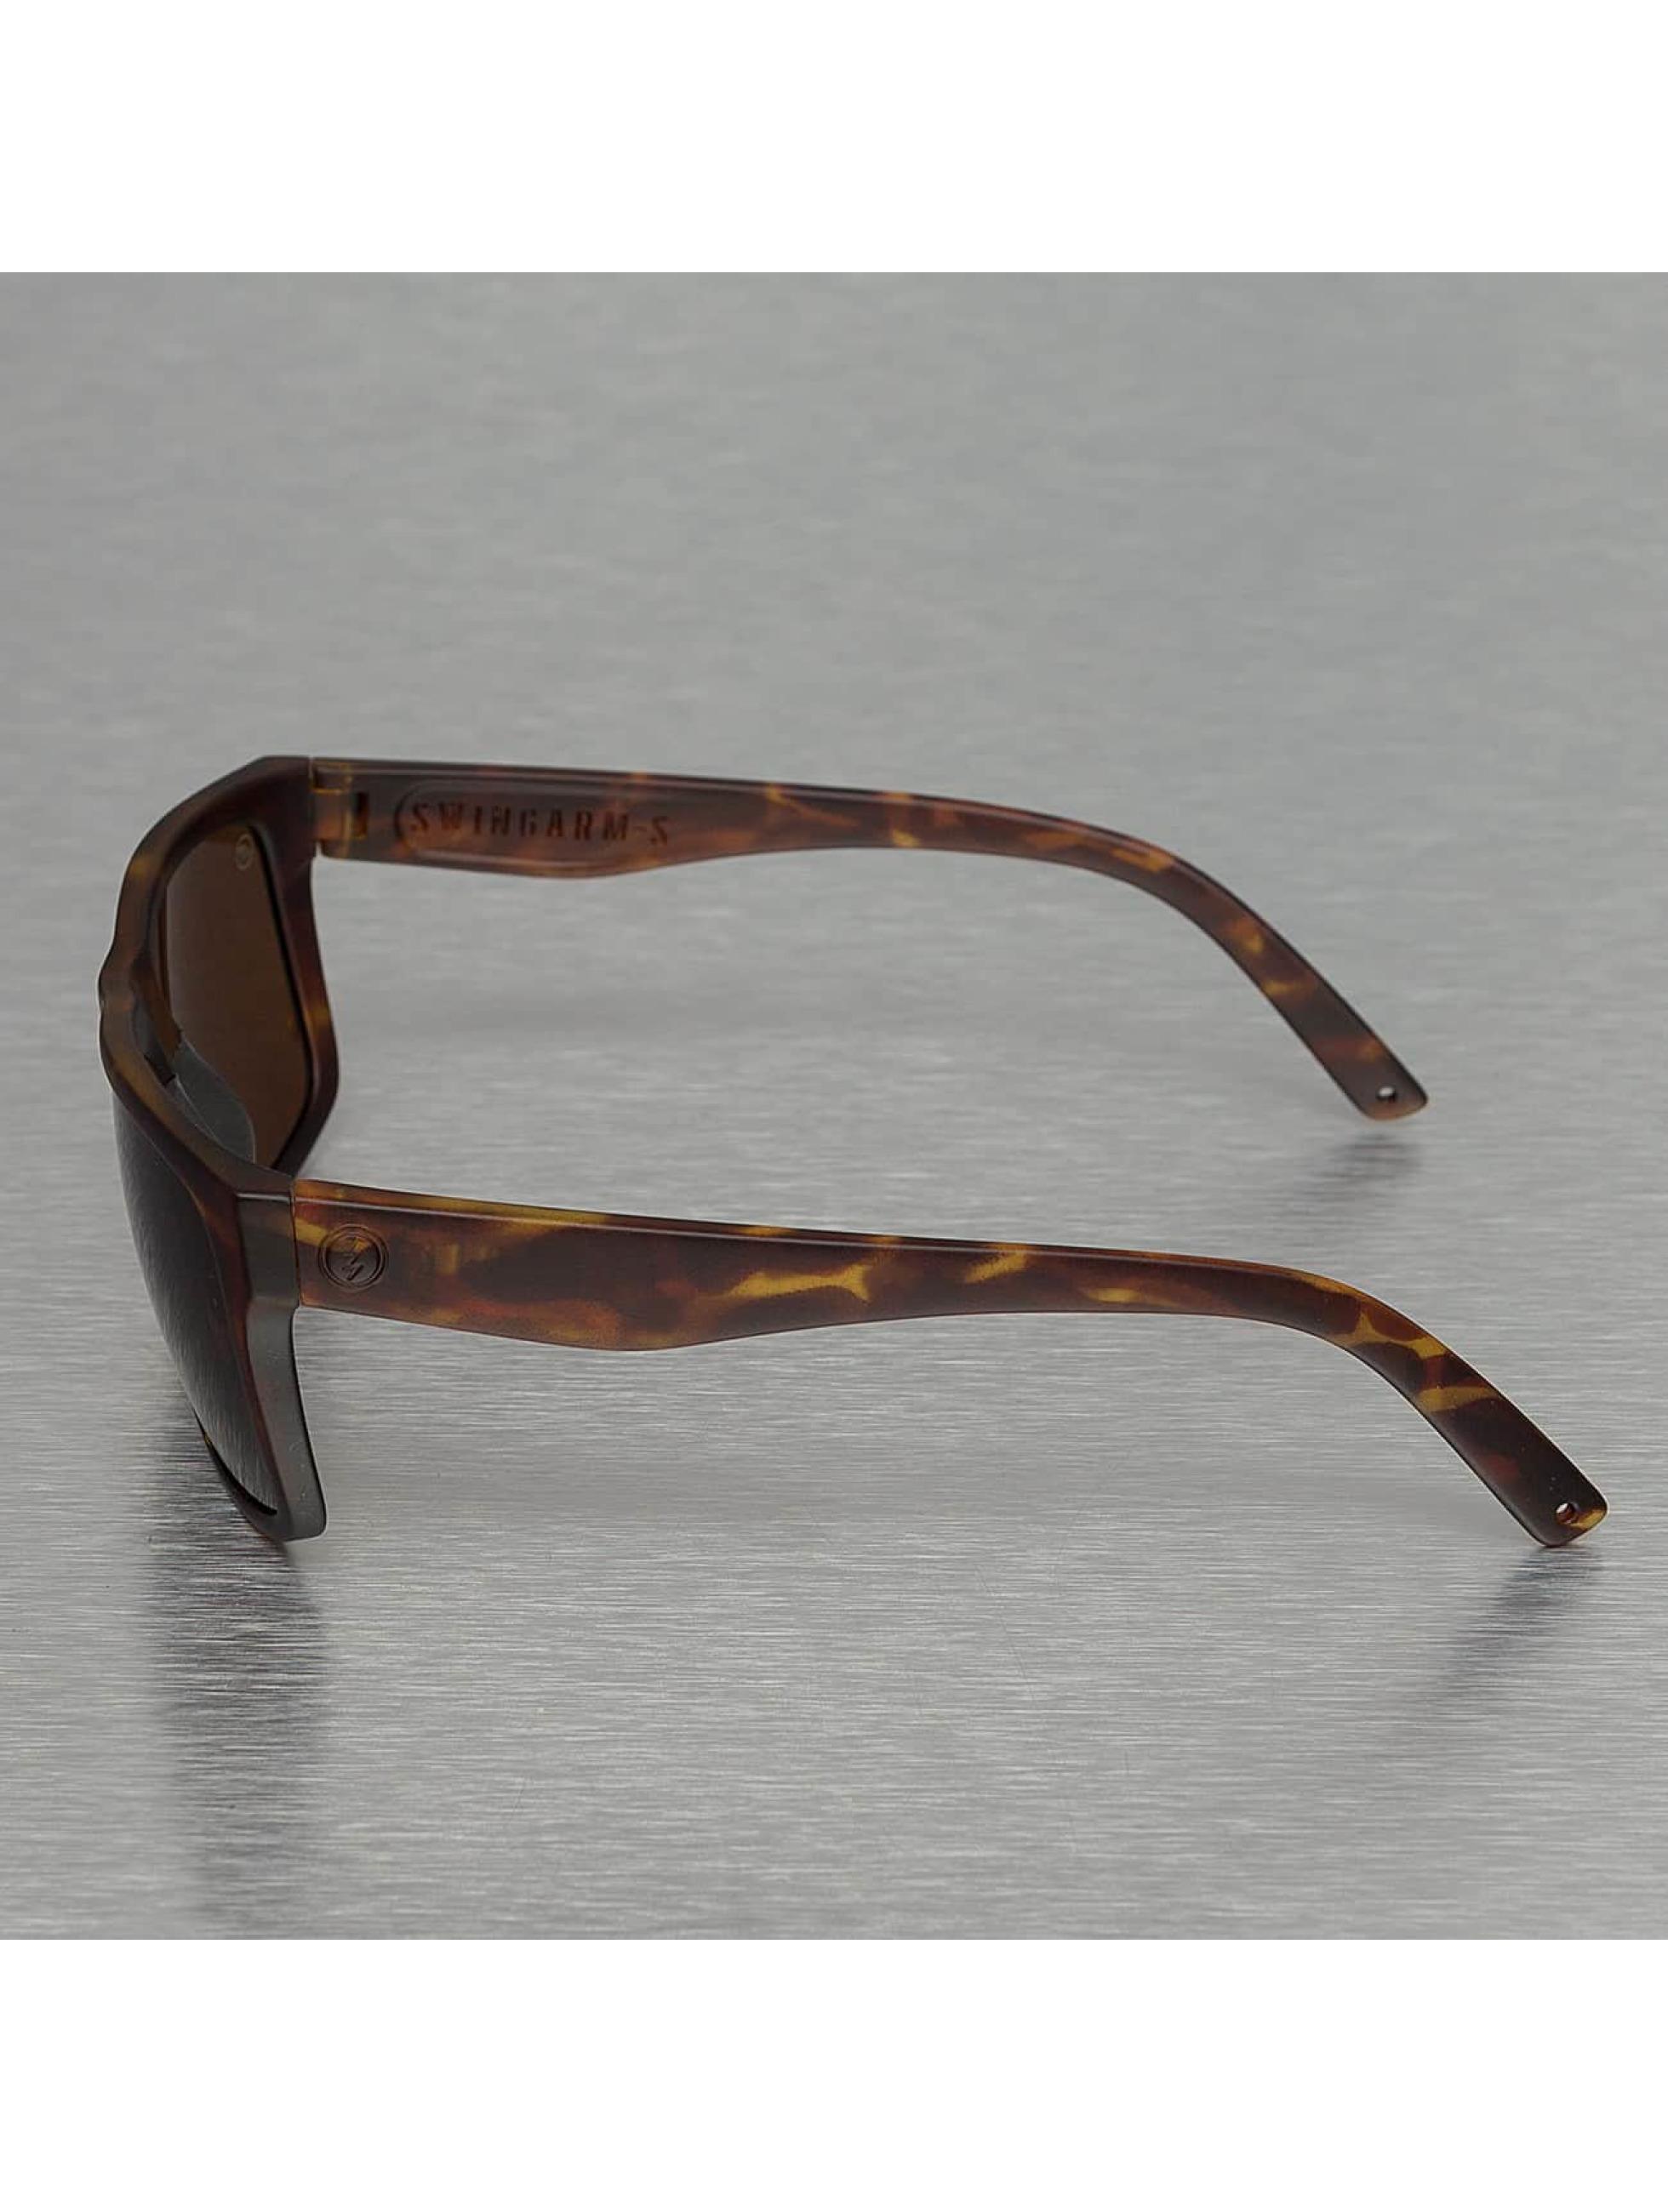 Electric Sunglasses SWINGARM S brown